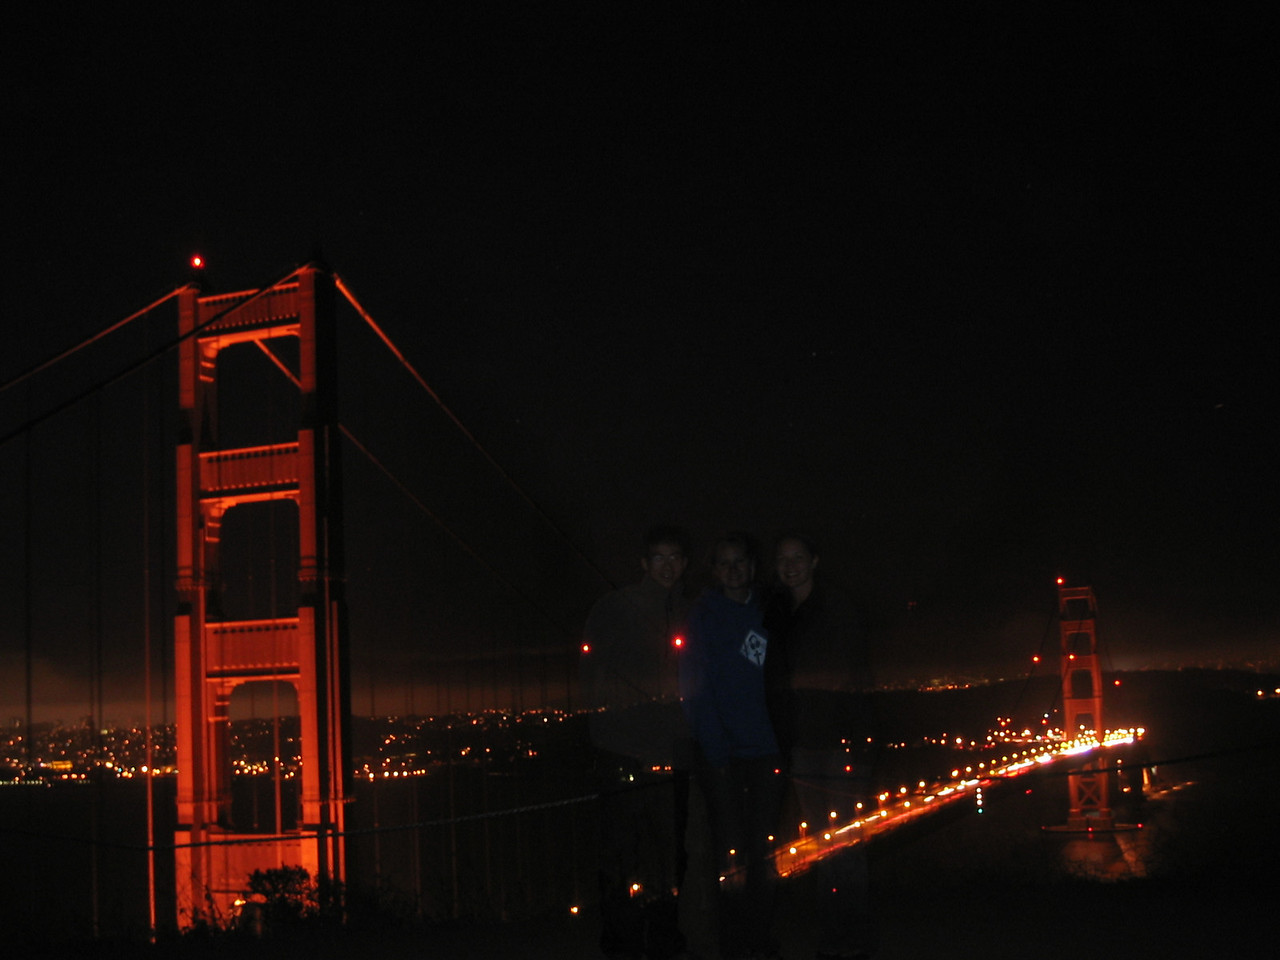 2004 07 12 Monday - Melody sees dead people @ Golden Gate Bridge  2